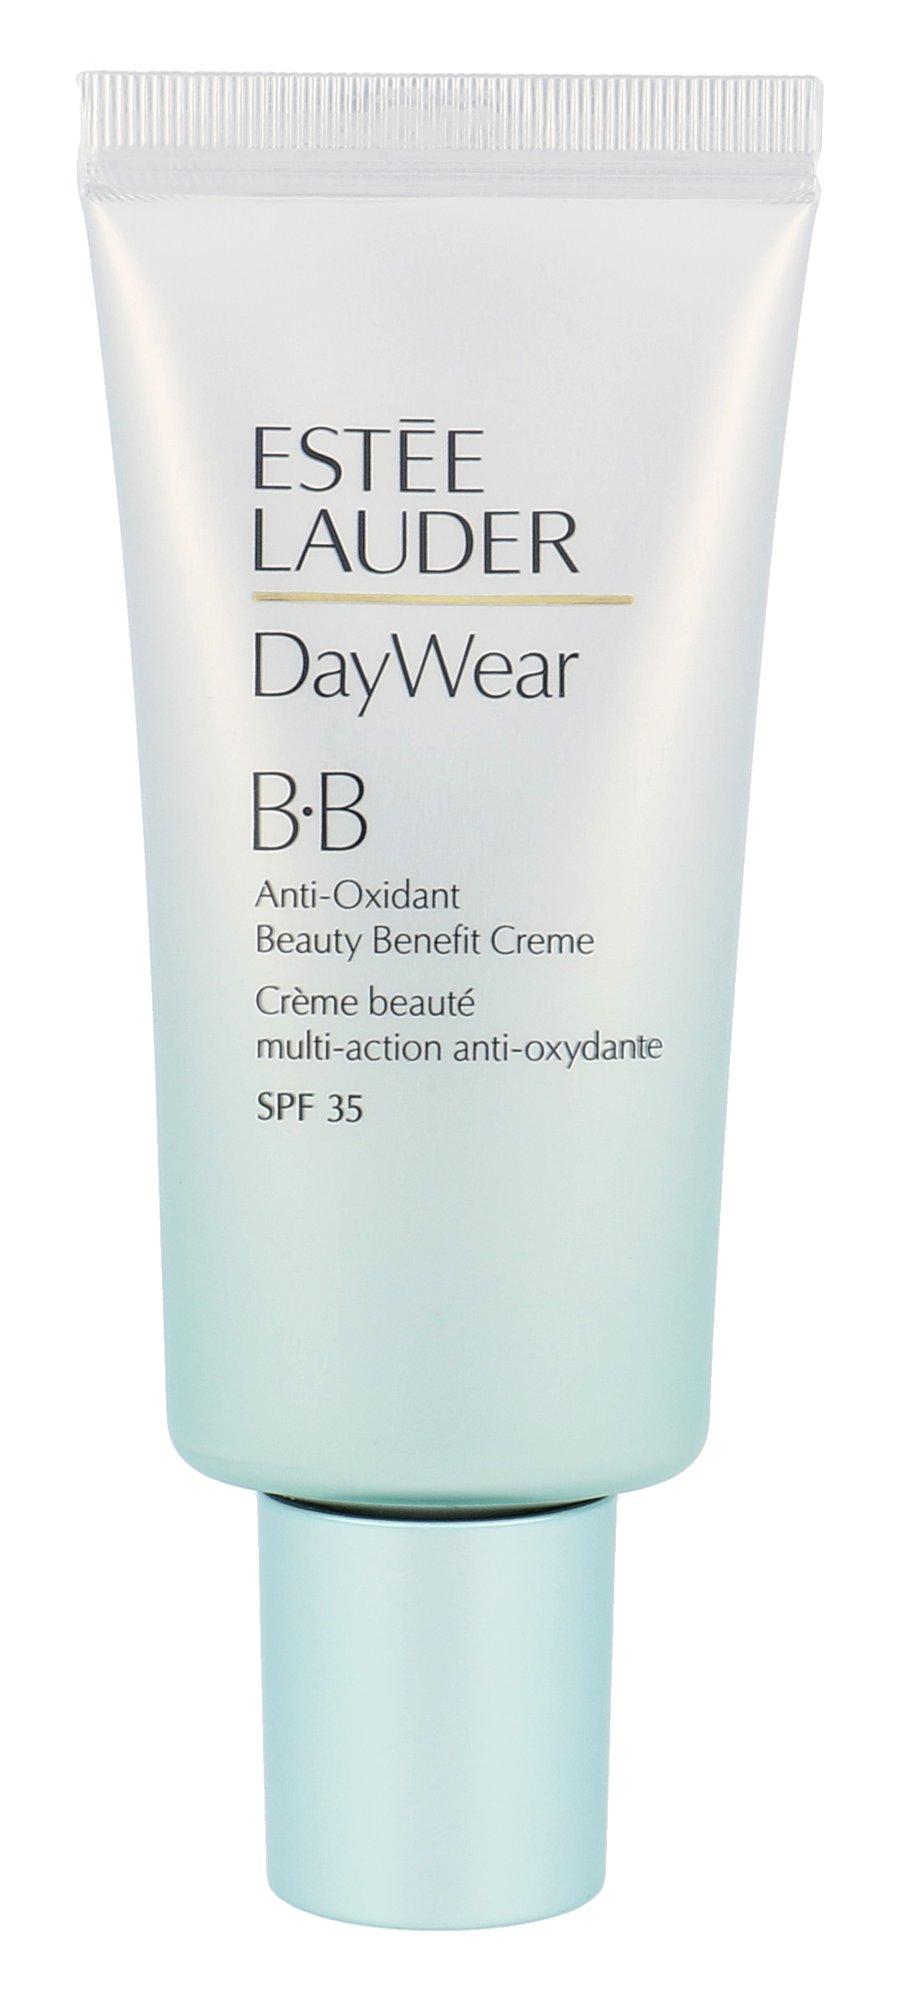 Estée Lauder DayWear BB Cream (01 Light) SPF 35 30 ml